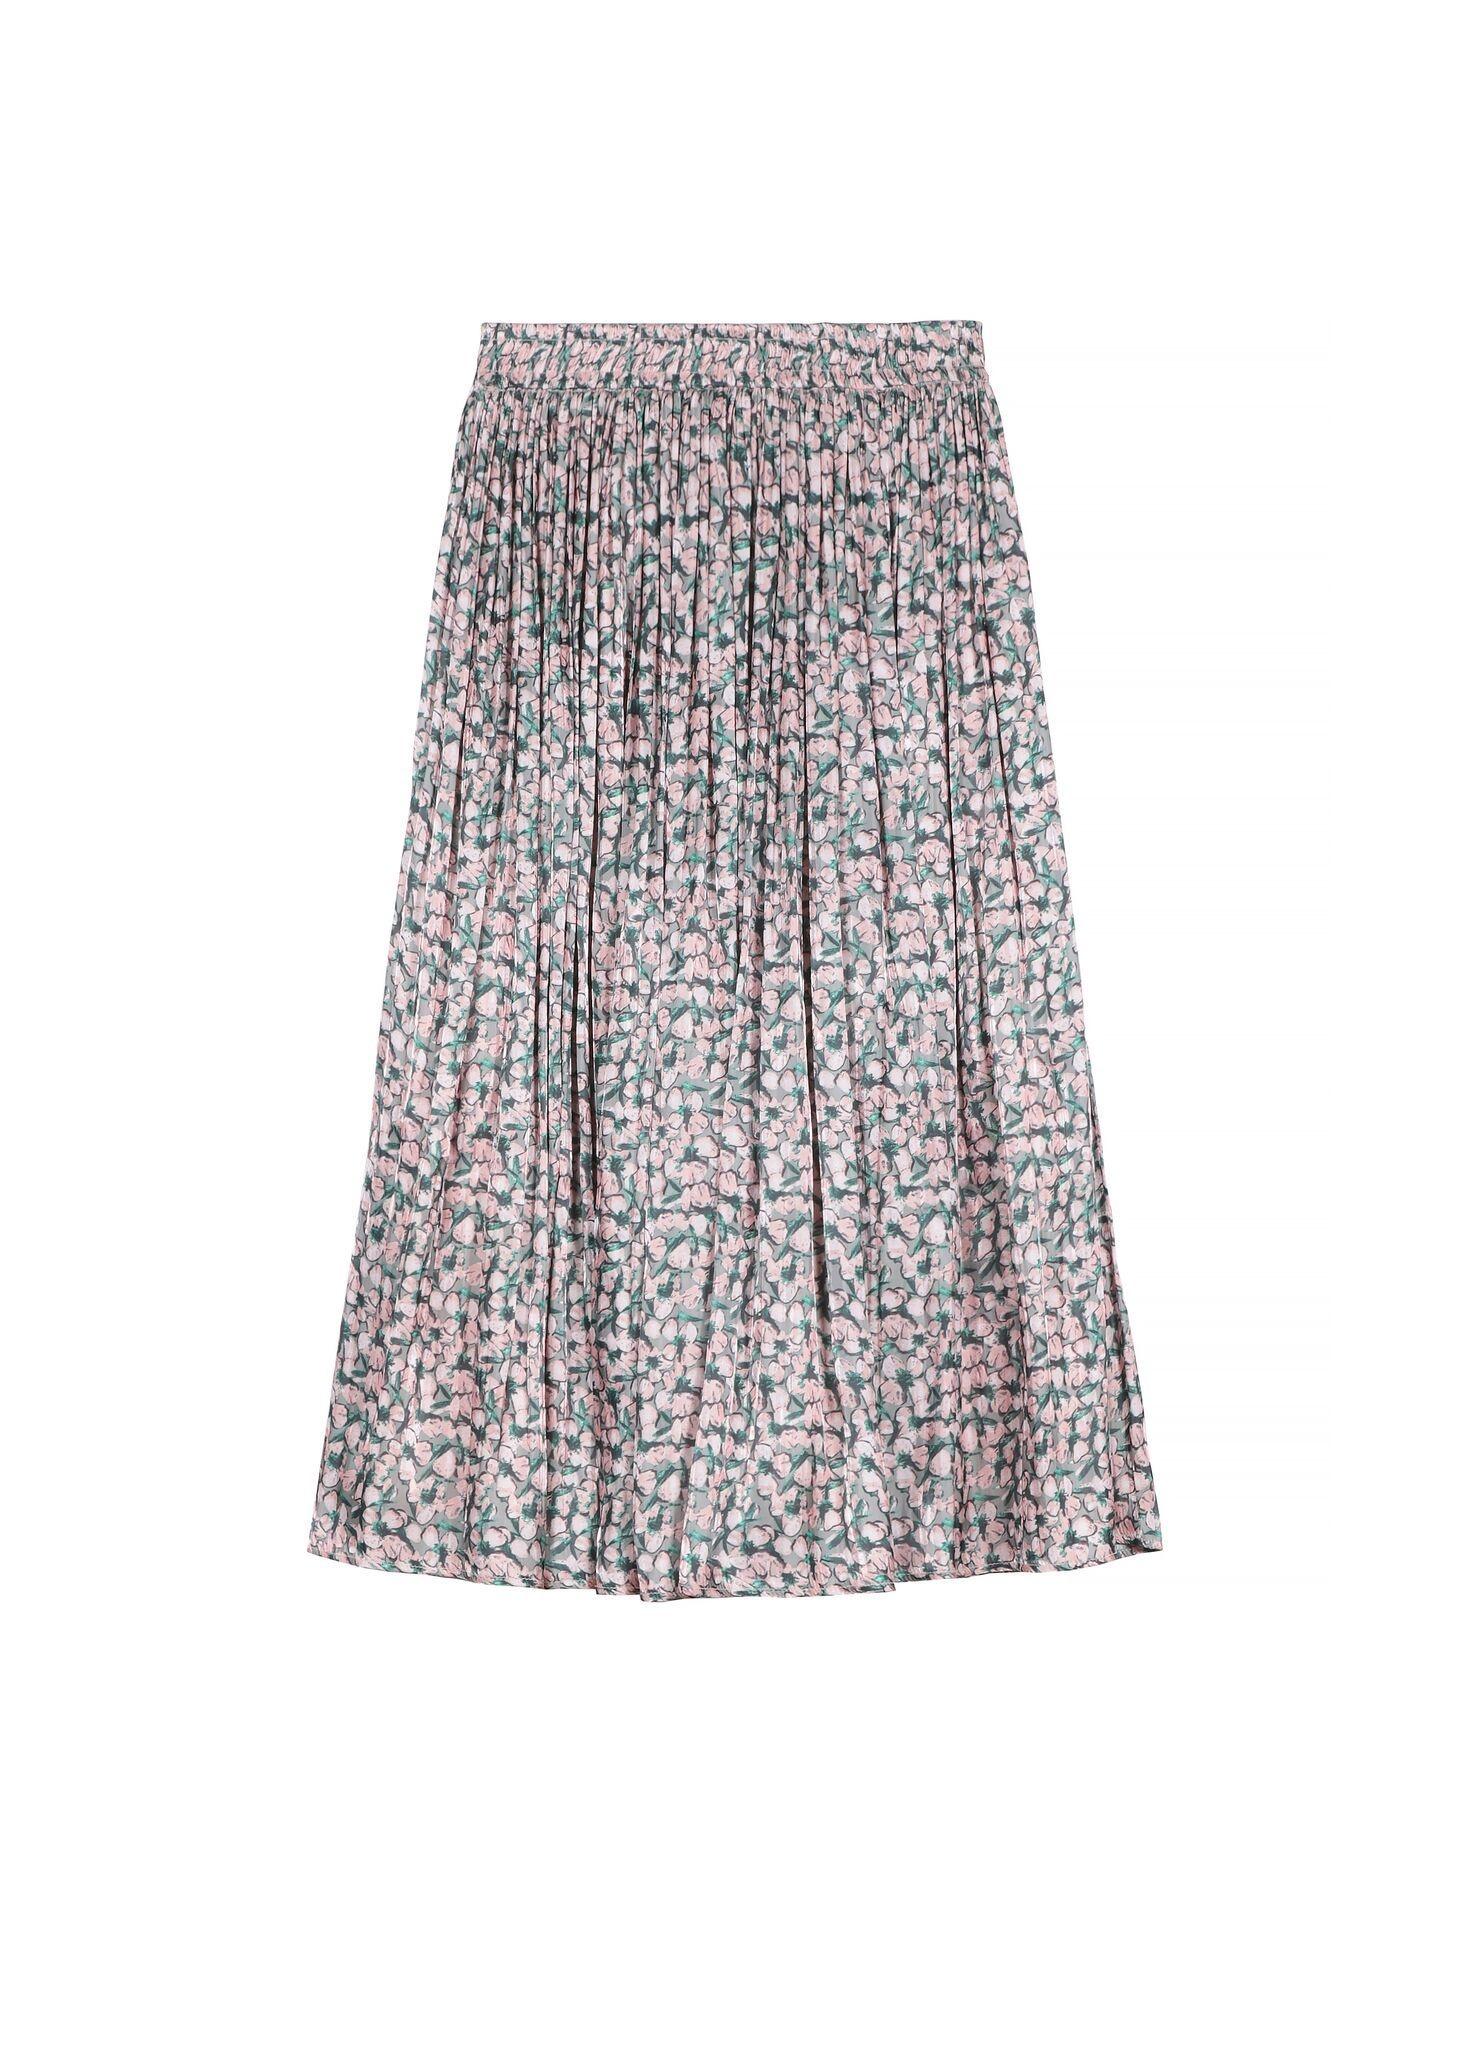 Frnch Pink Floral Skirt